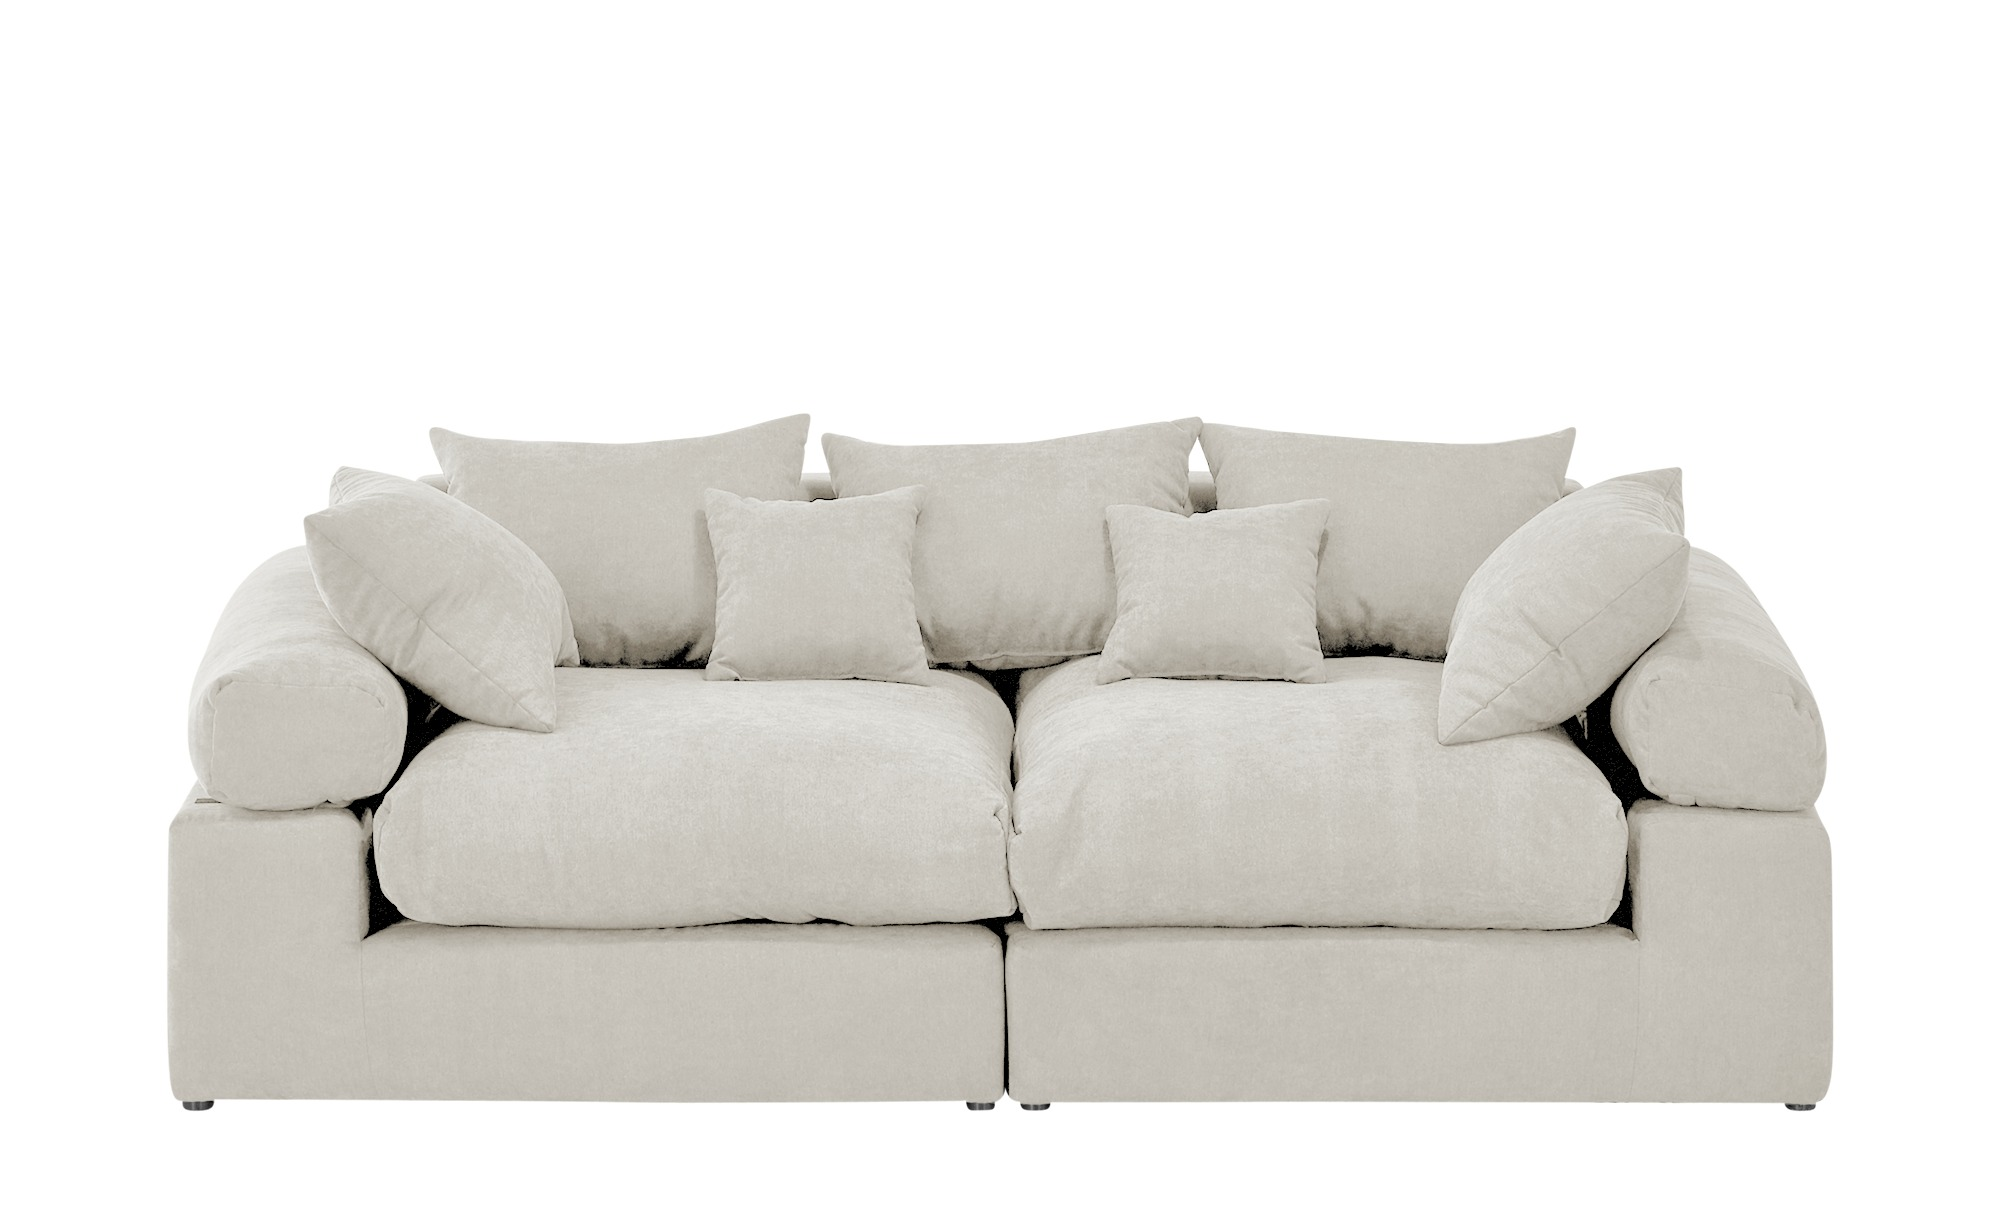 smart Big Sofa  Lionore ¦ weiß ¦ Maße (cm): B: 242 H: 86 T: 121 Polstermöbel > Sofas > Big-Sofas - Höffner